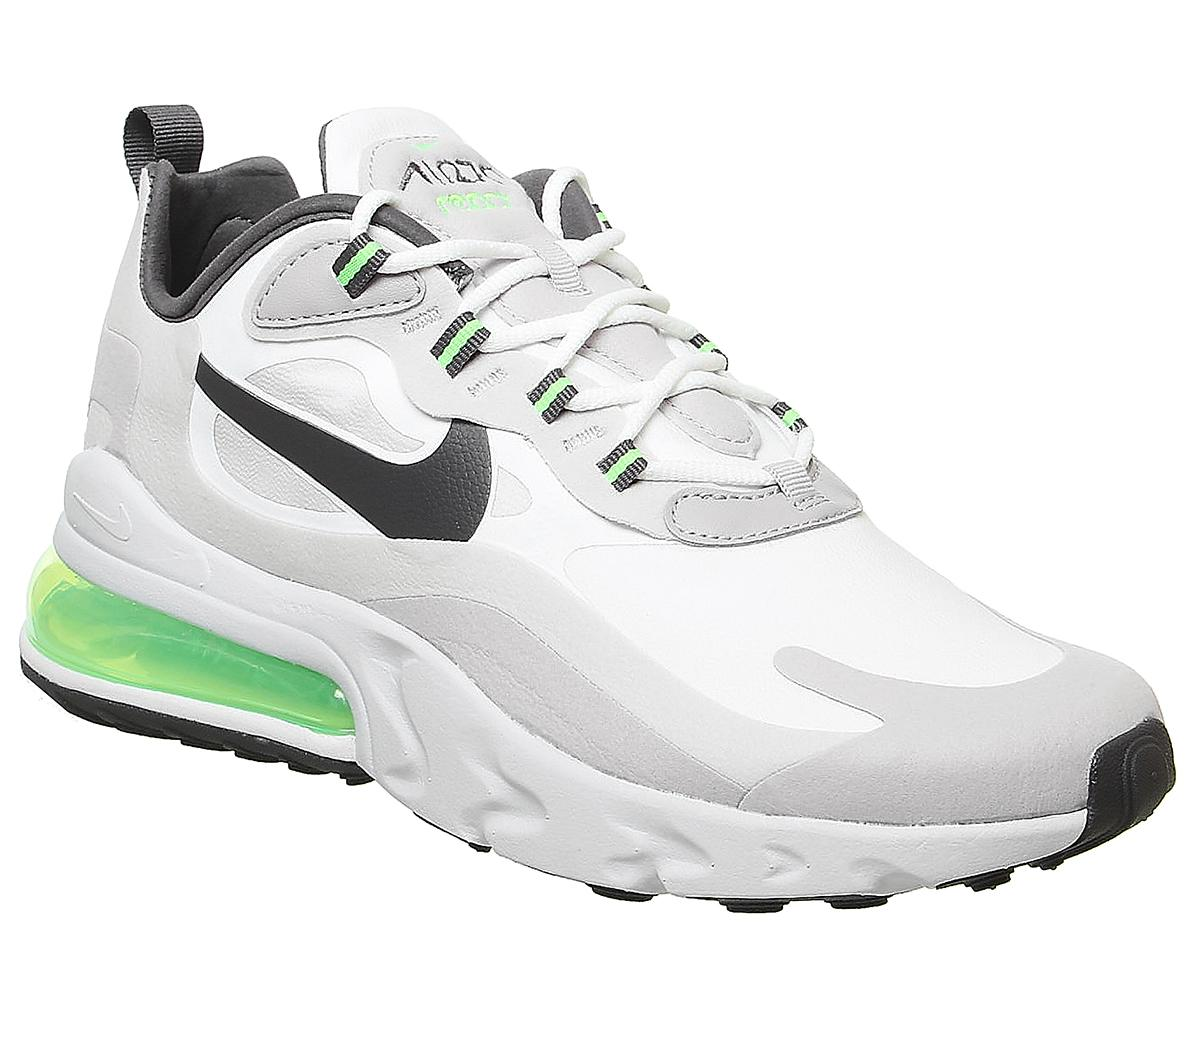 referir llave inglesa transferencia de dinero  Nike Air Max 270 React Summit White Green Vast Grey Silver Lilac Grey -  Unisex Sports